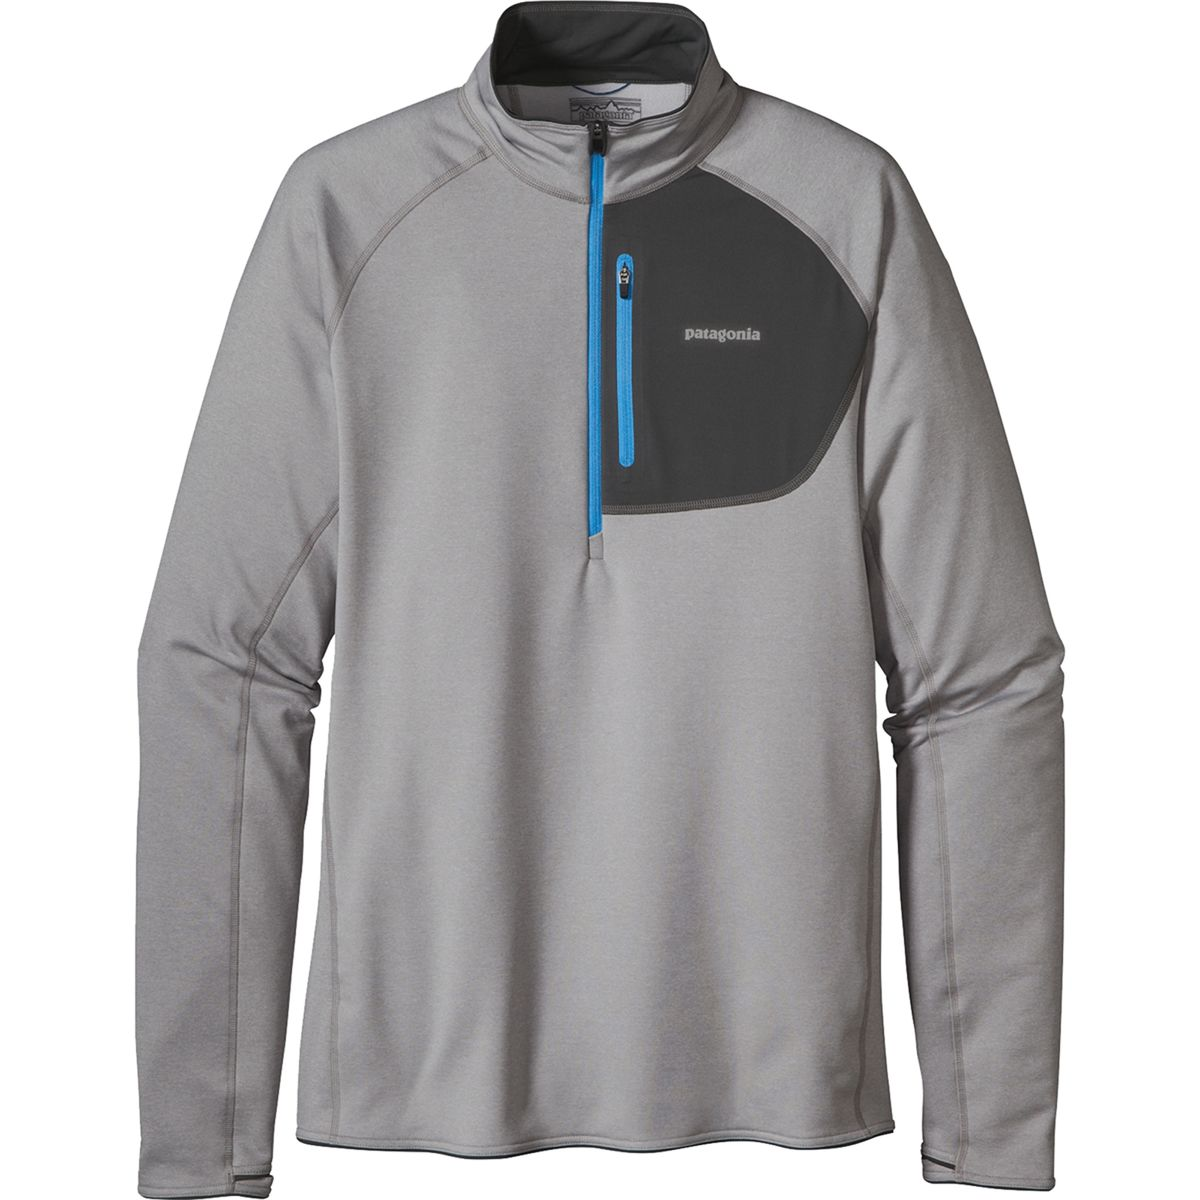 Patagonia Thermal Speedwork Zip-Neck Top - Men